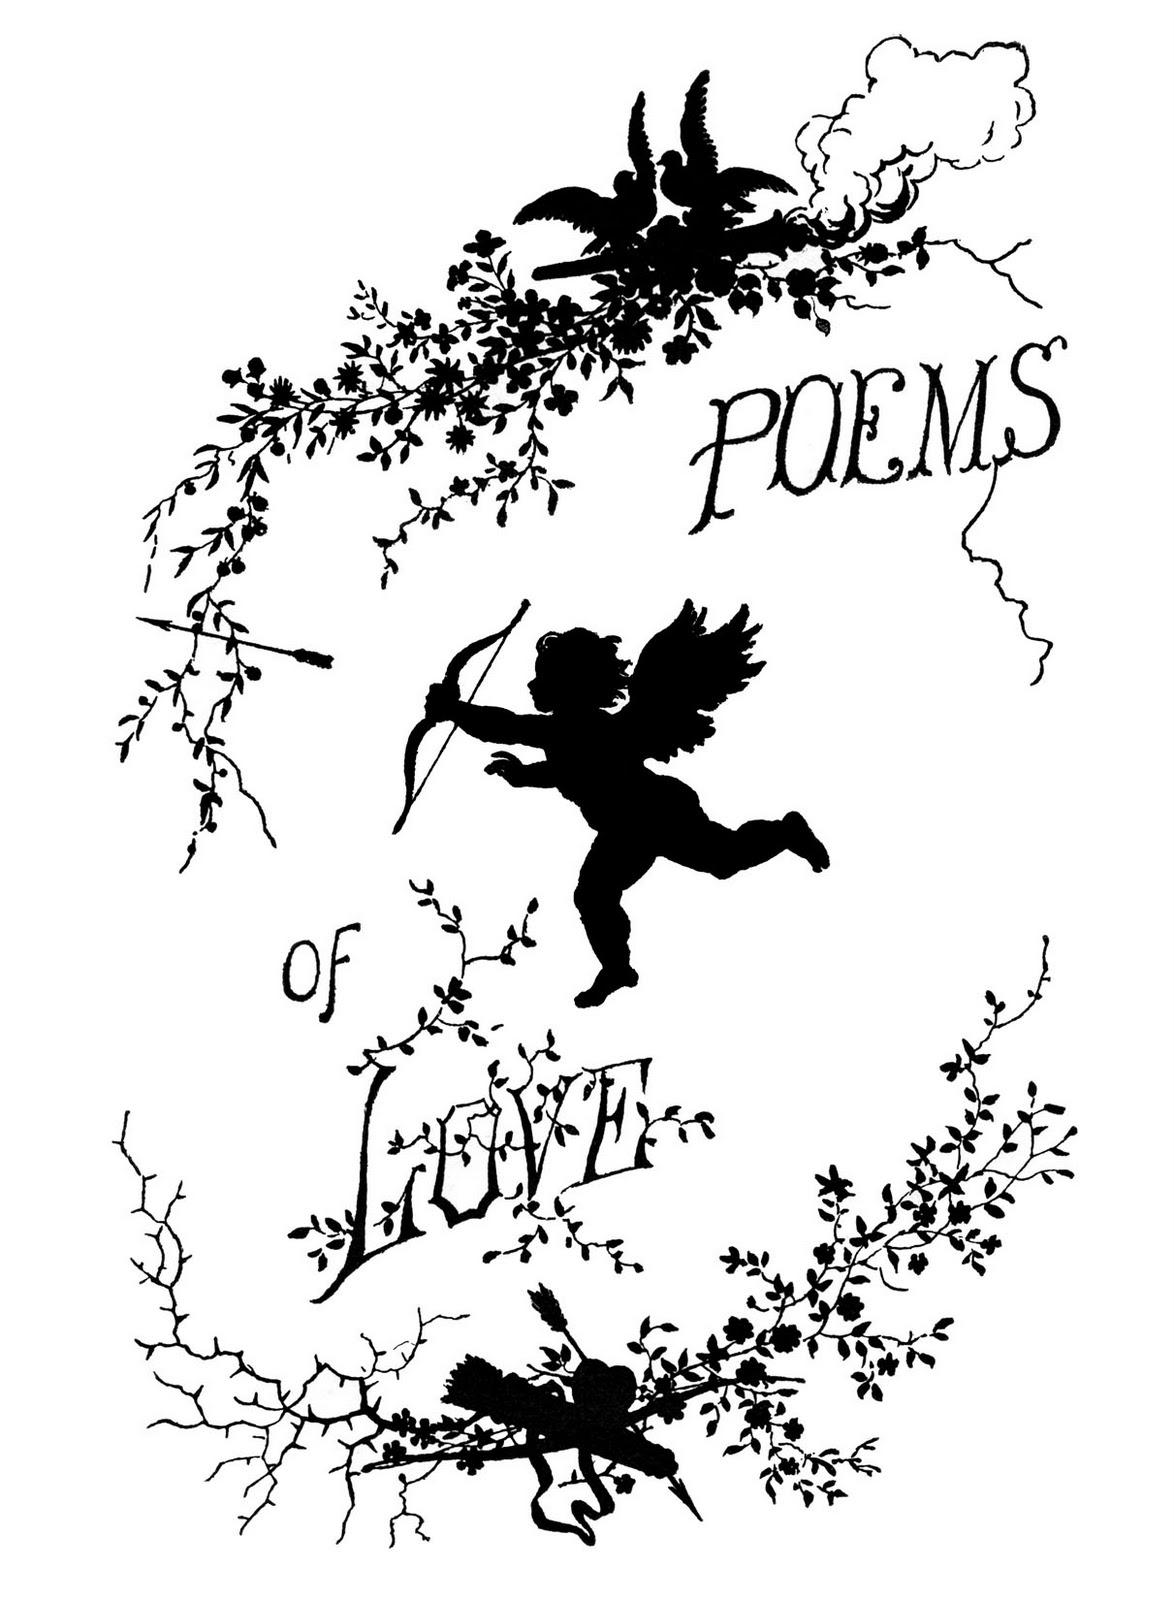 Free Poem Cliparts Download Free Clip Art Free Clip Art